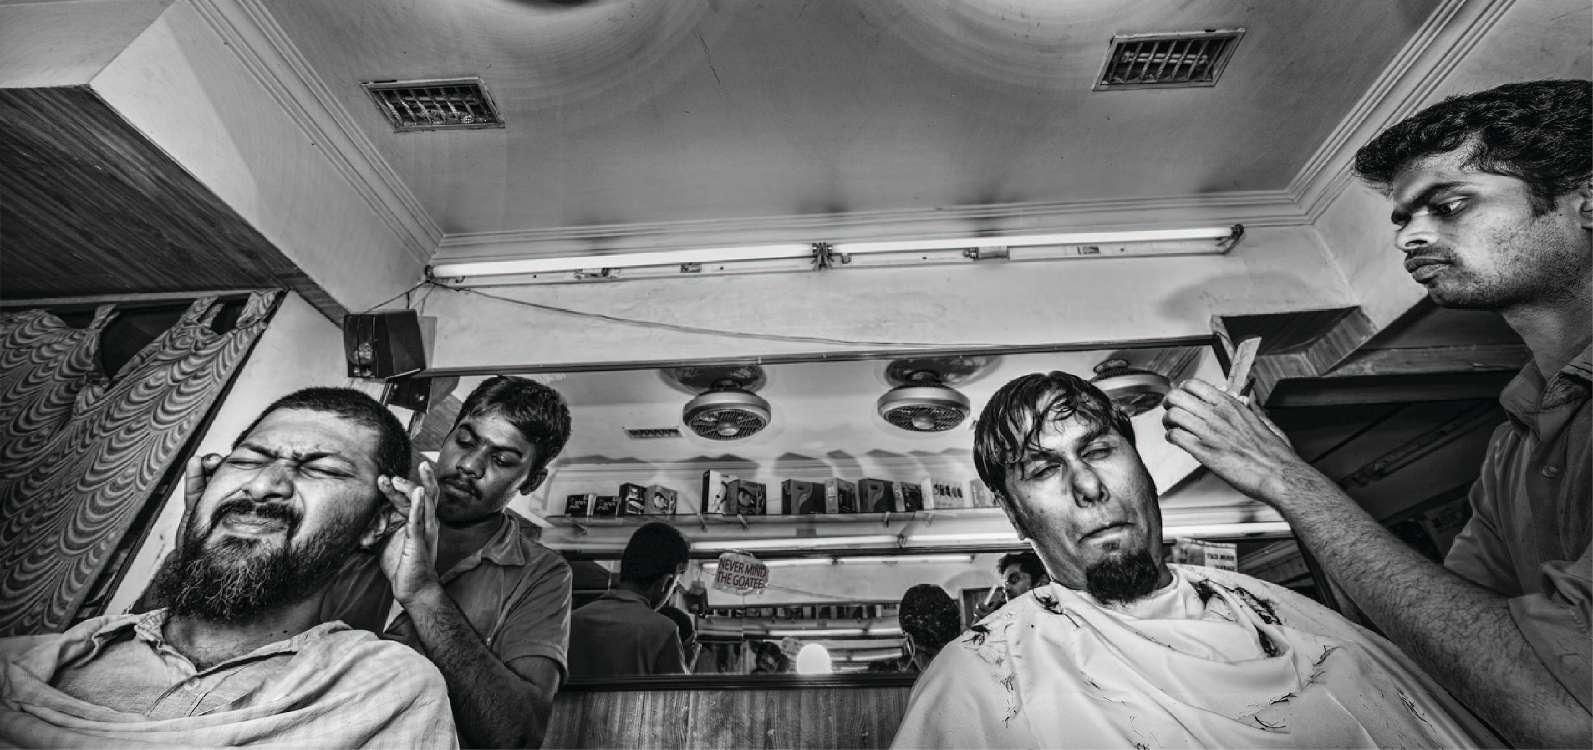 Barbershop Harmony